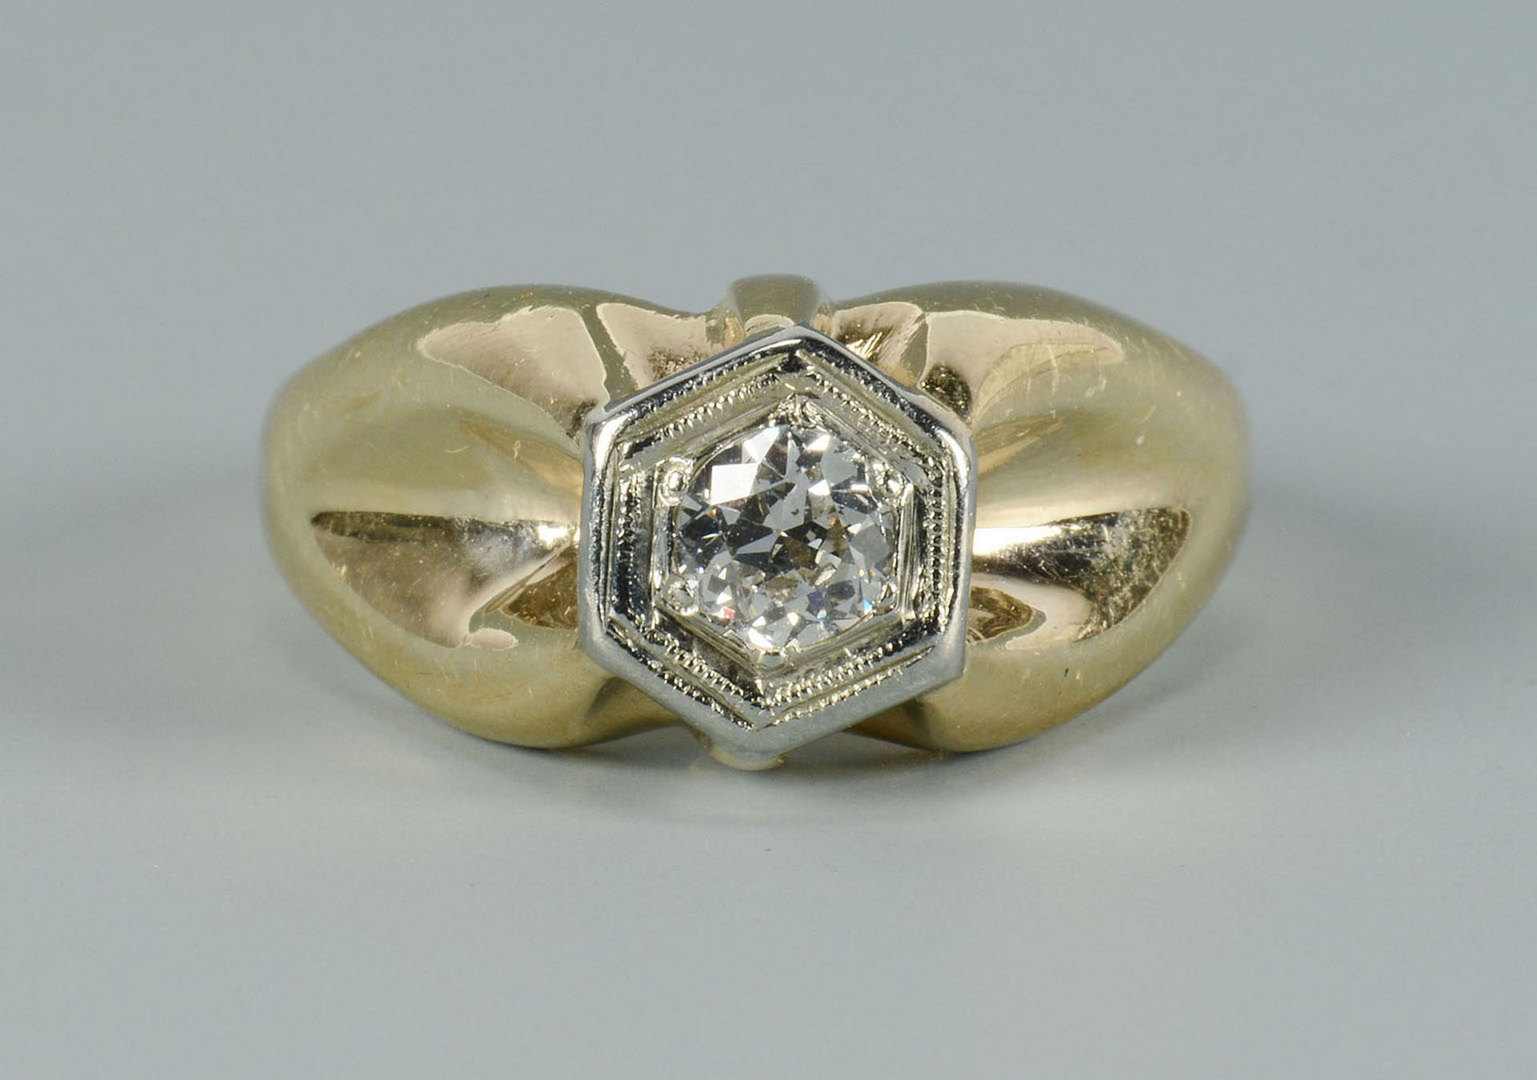 Lot 283: 14k Diamond Dome Ring